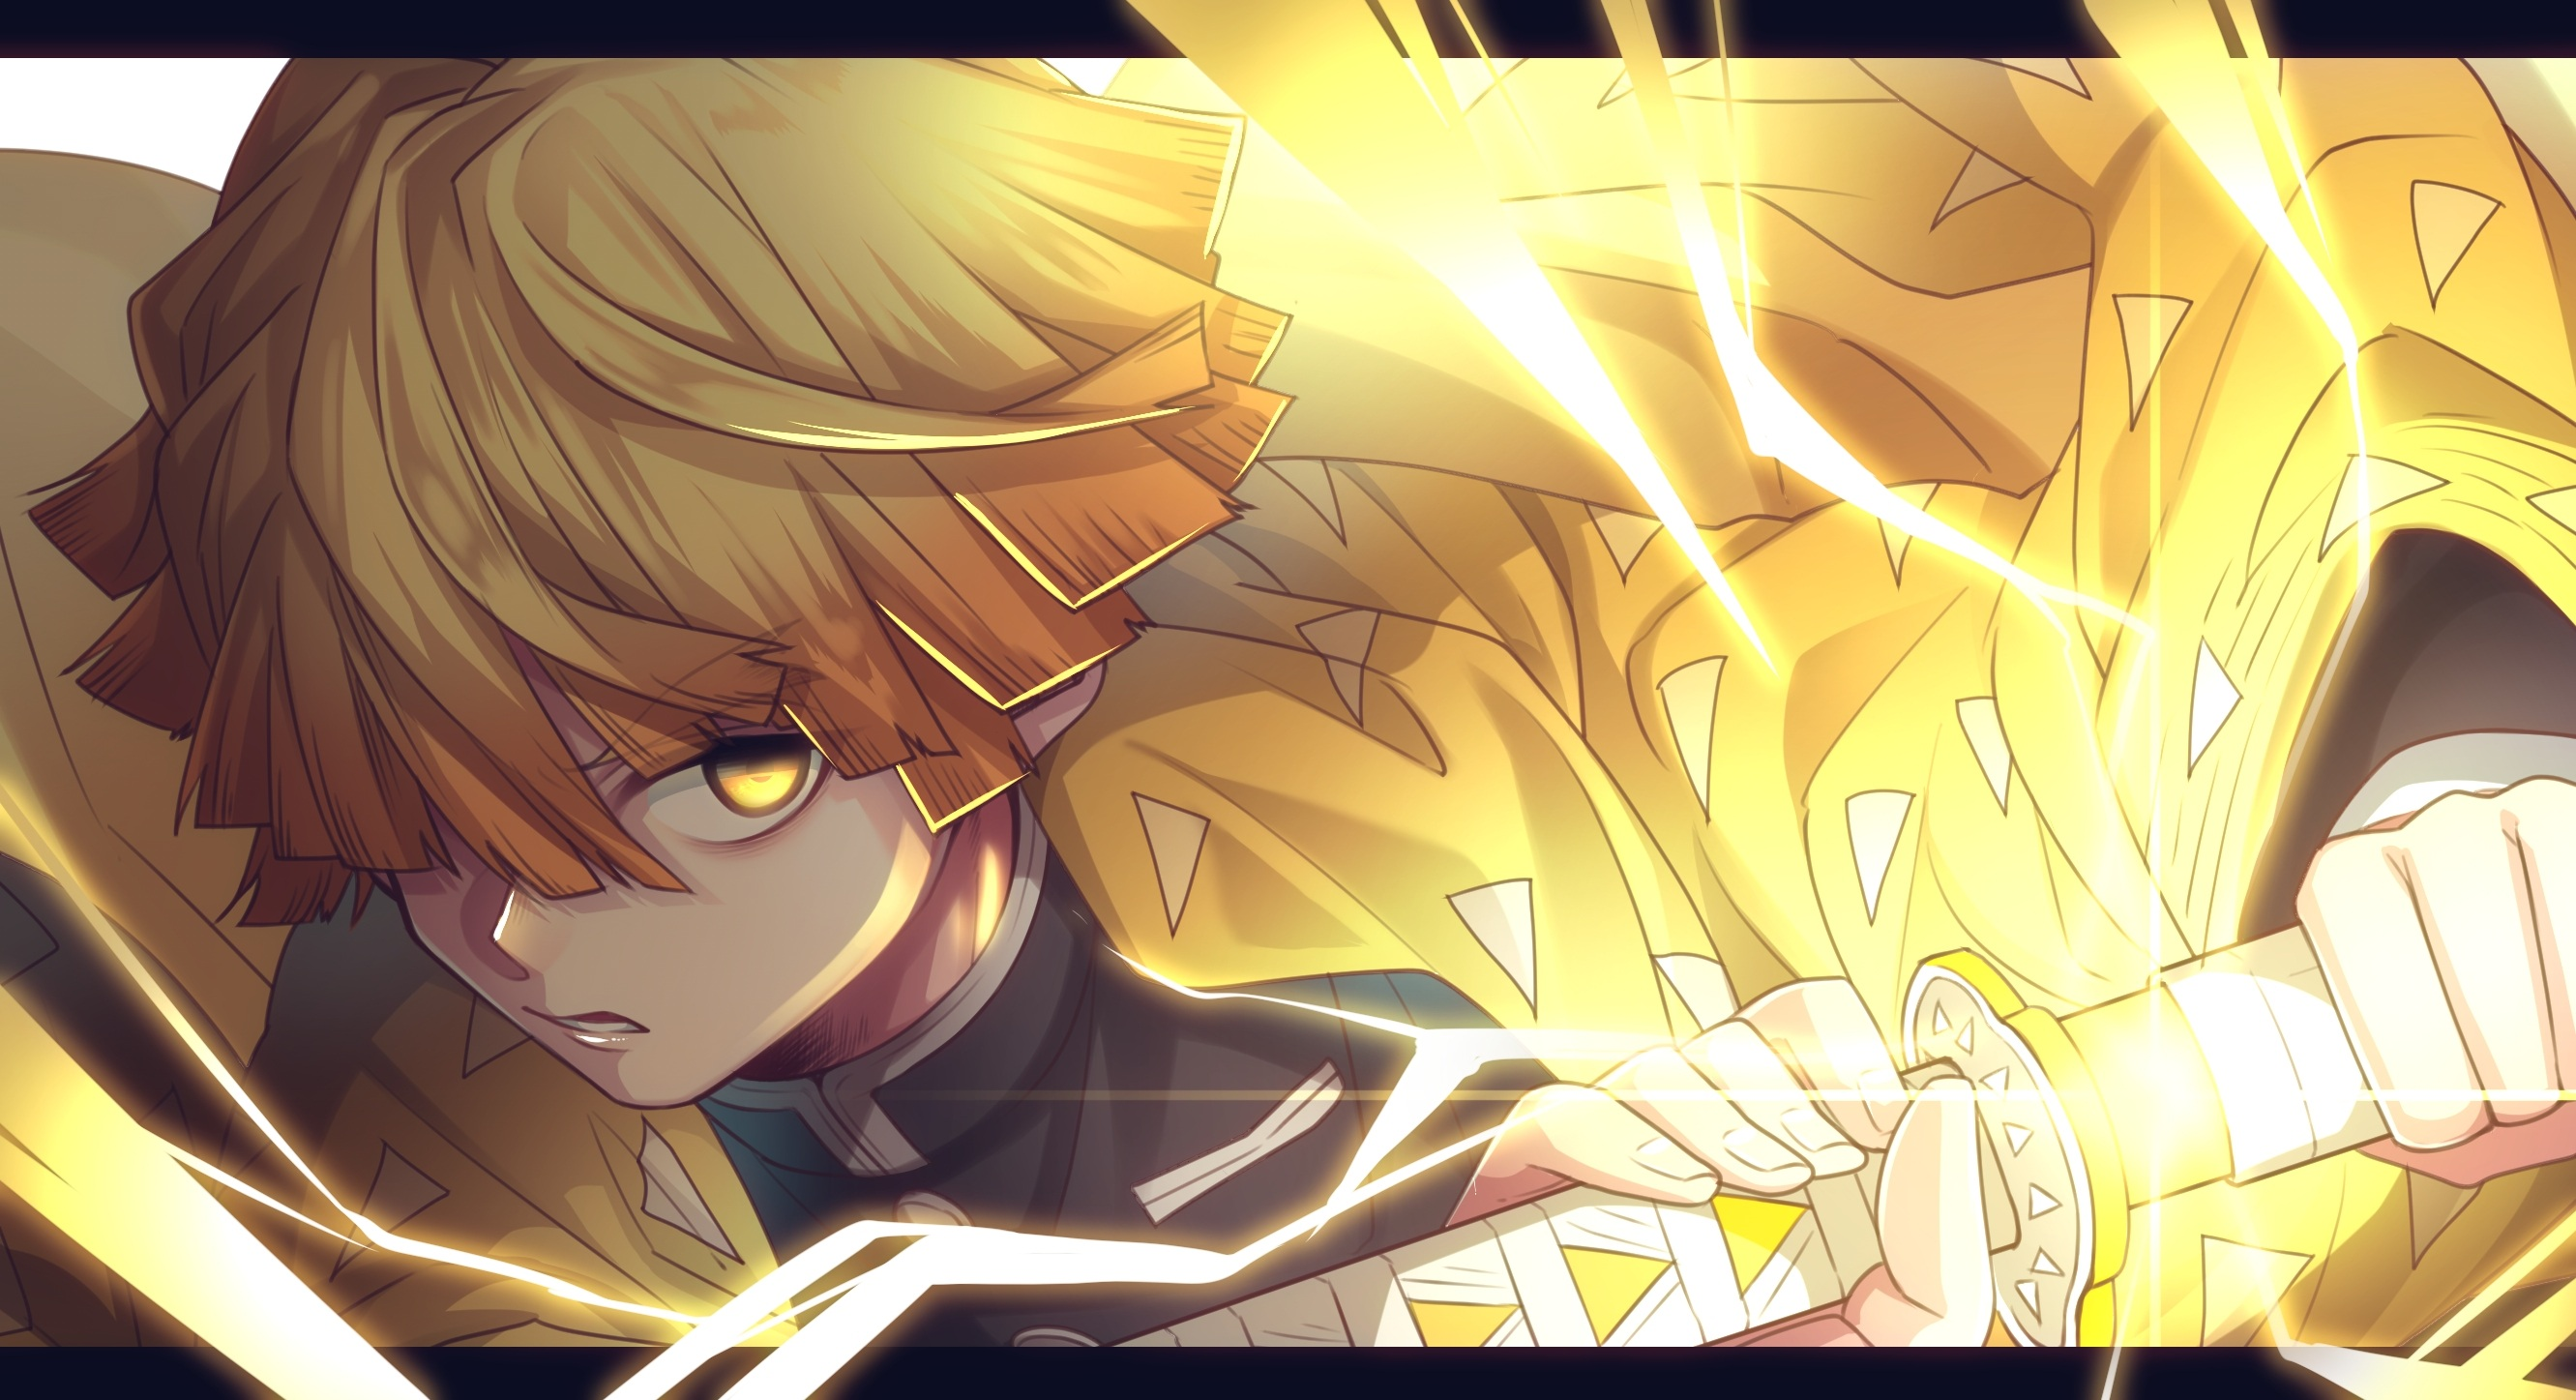 Get Anime Live Wallpaper Zenitsu Gif - jasmanime